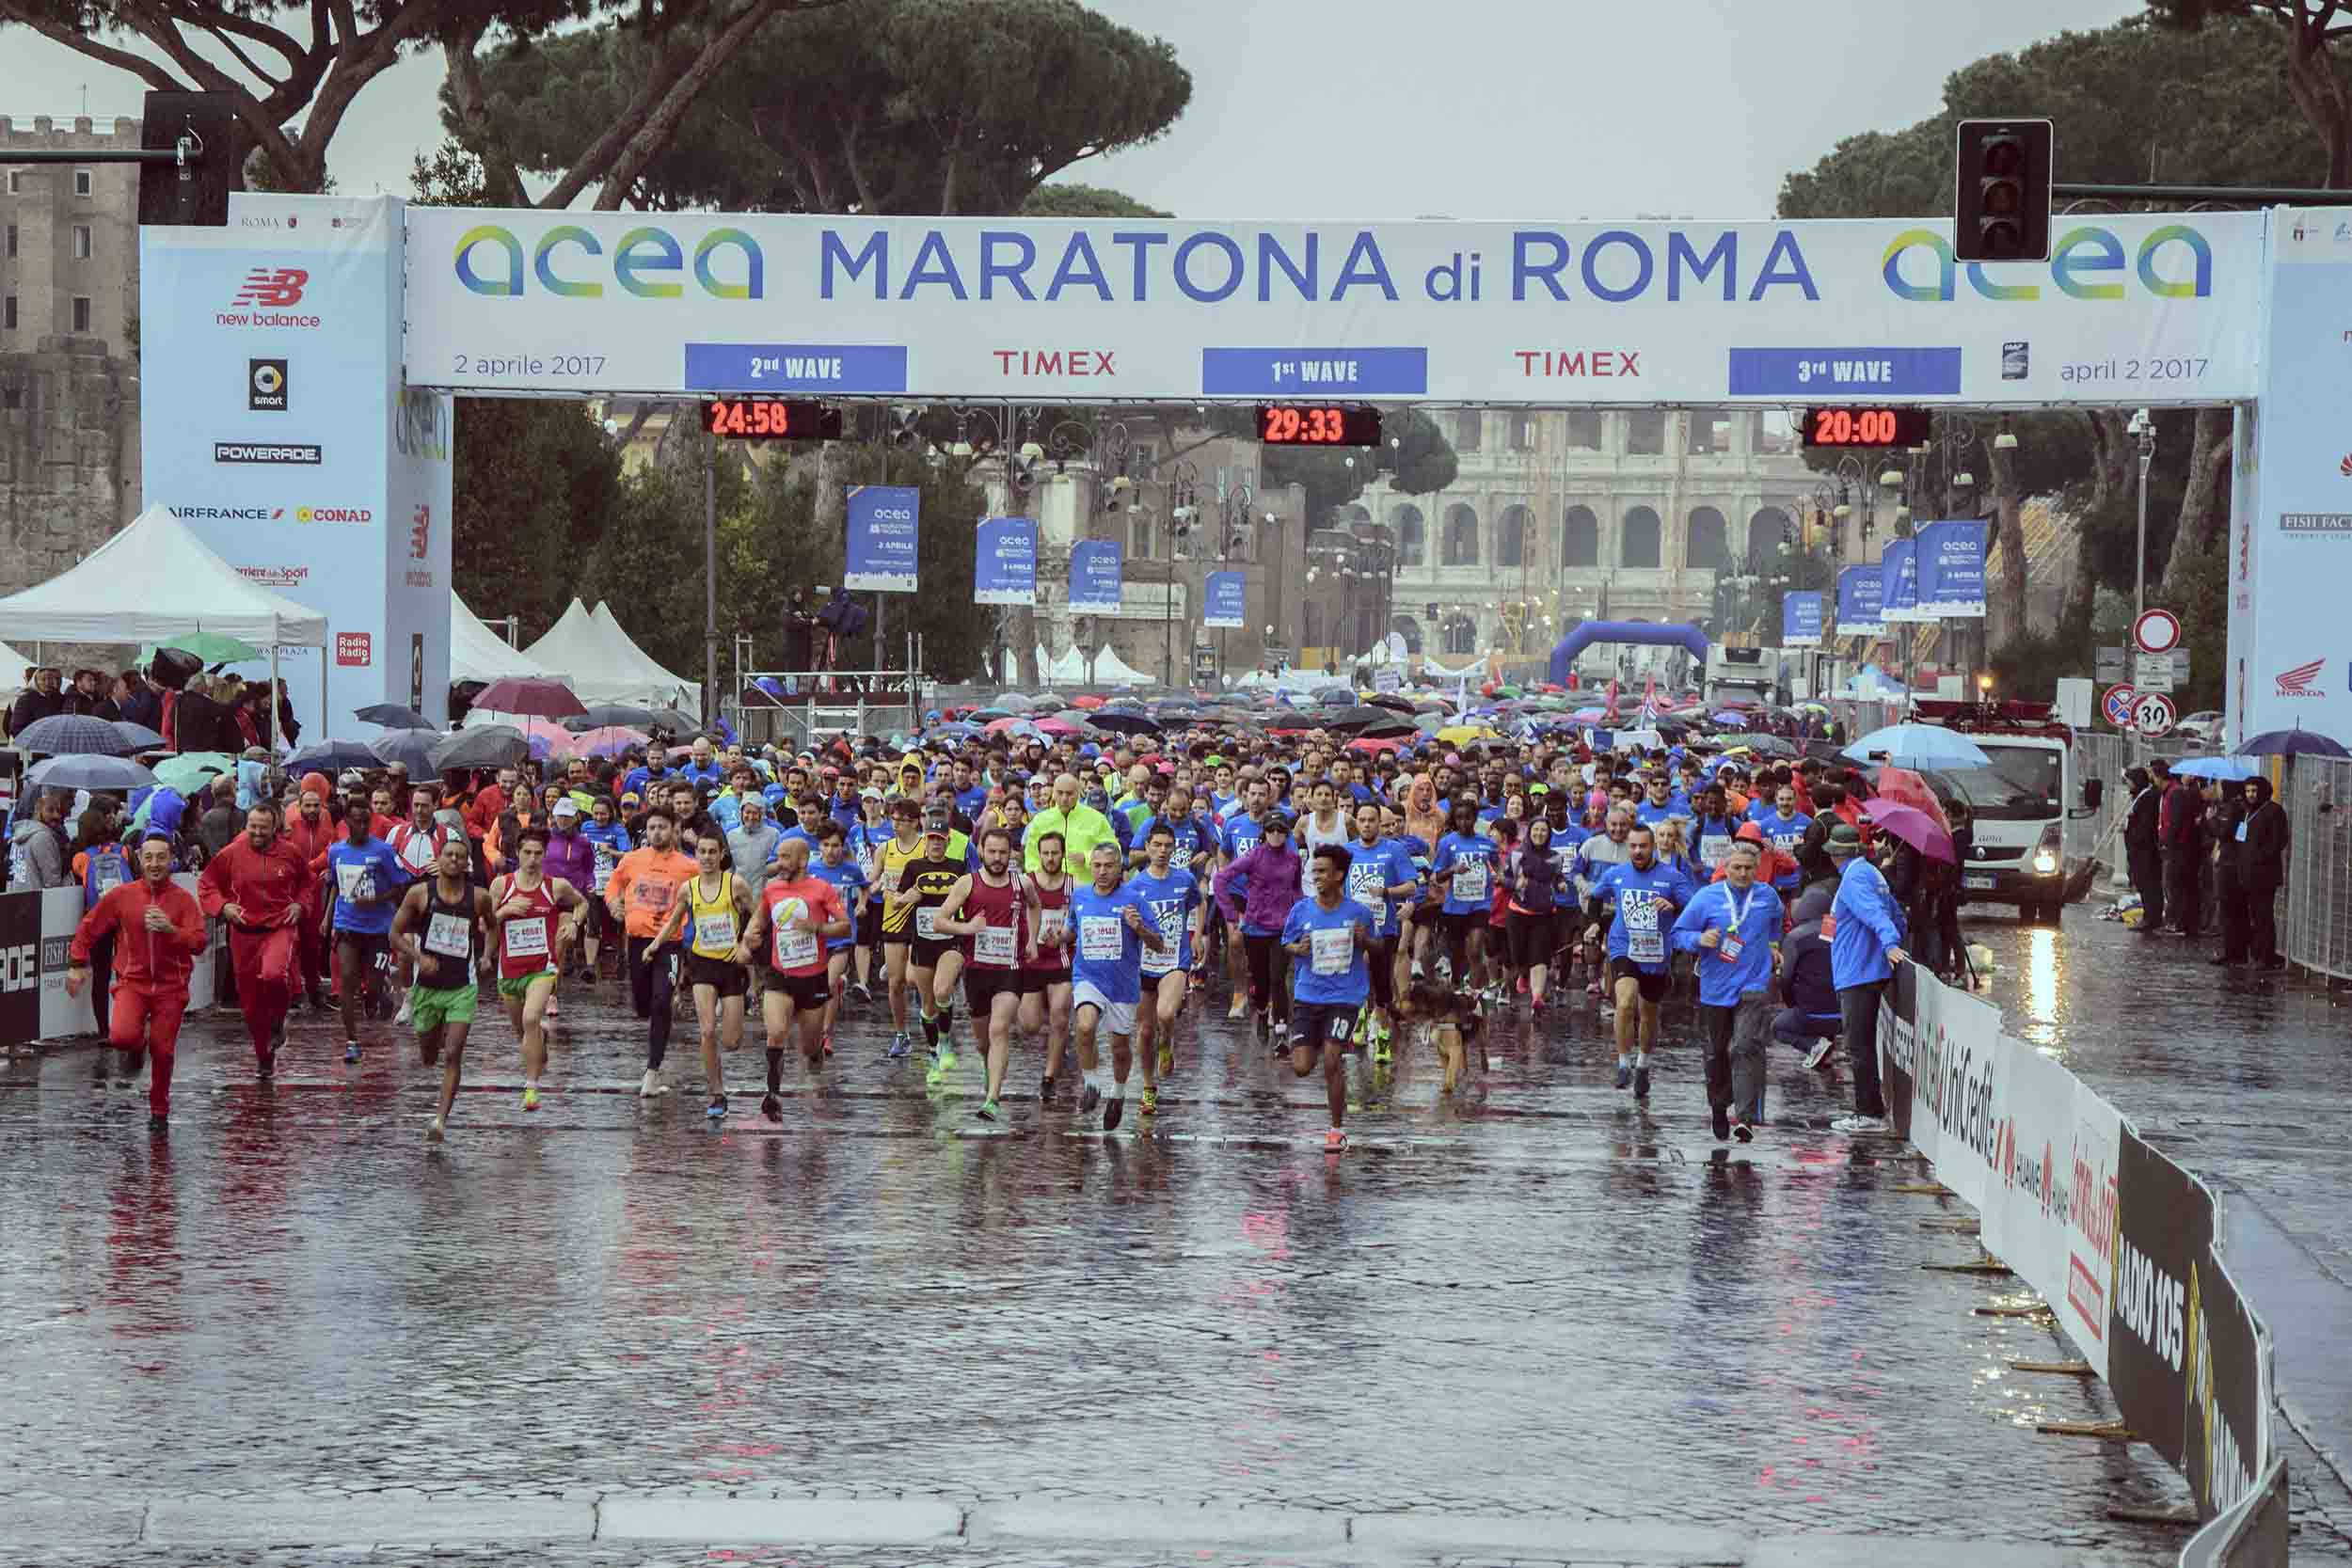 WORD GAMES Maratona di Roma, m5s vuol dire…